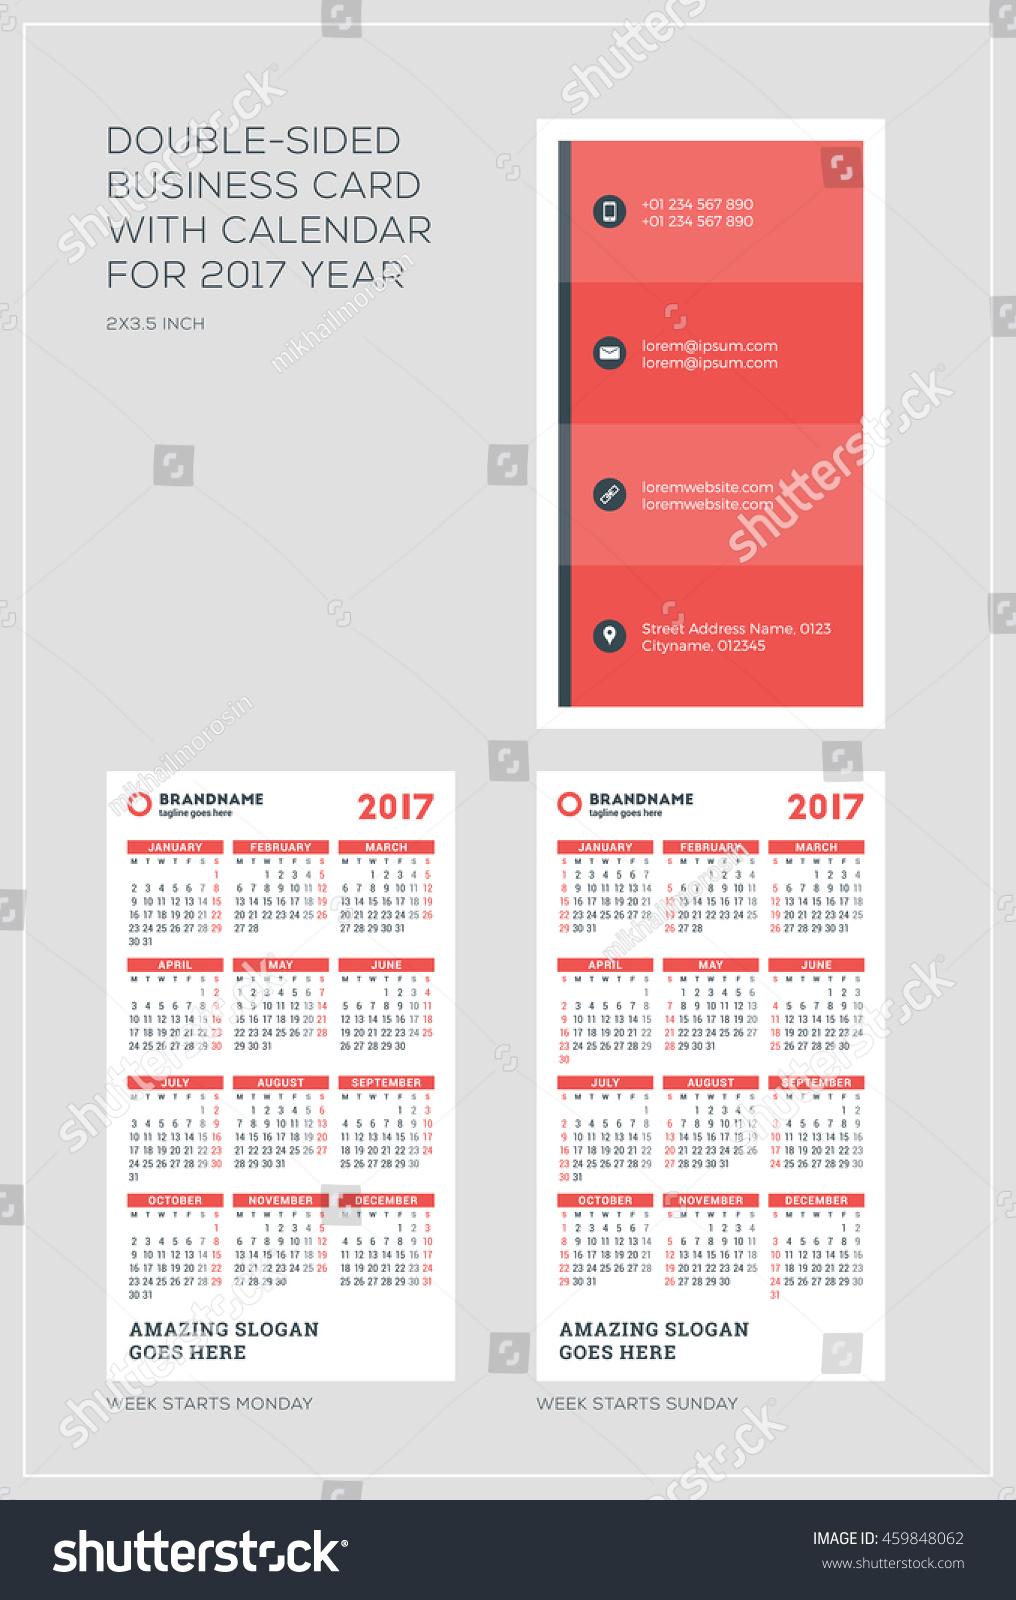 Doublesided Vertical Business Card Template Calendar Stock Vector ...